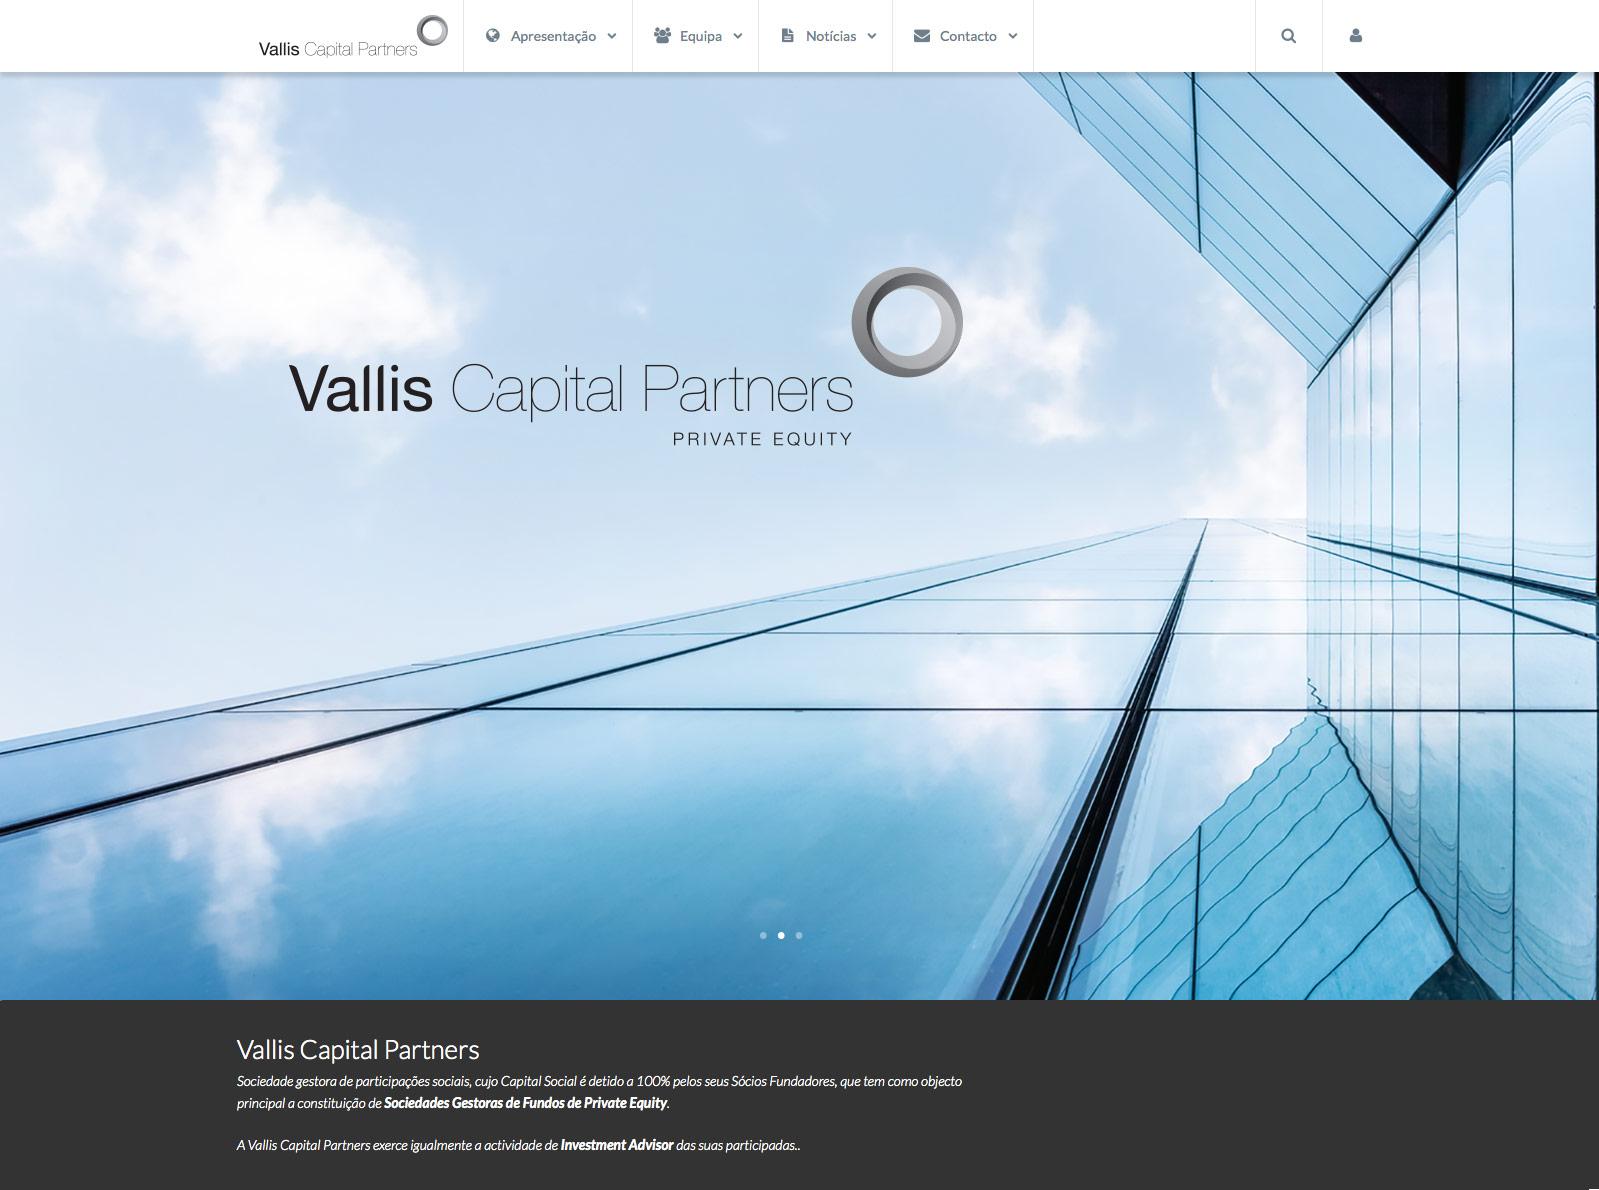 vallis capital partners background